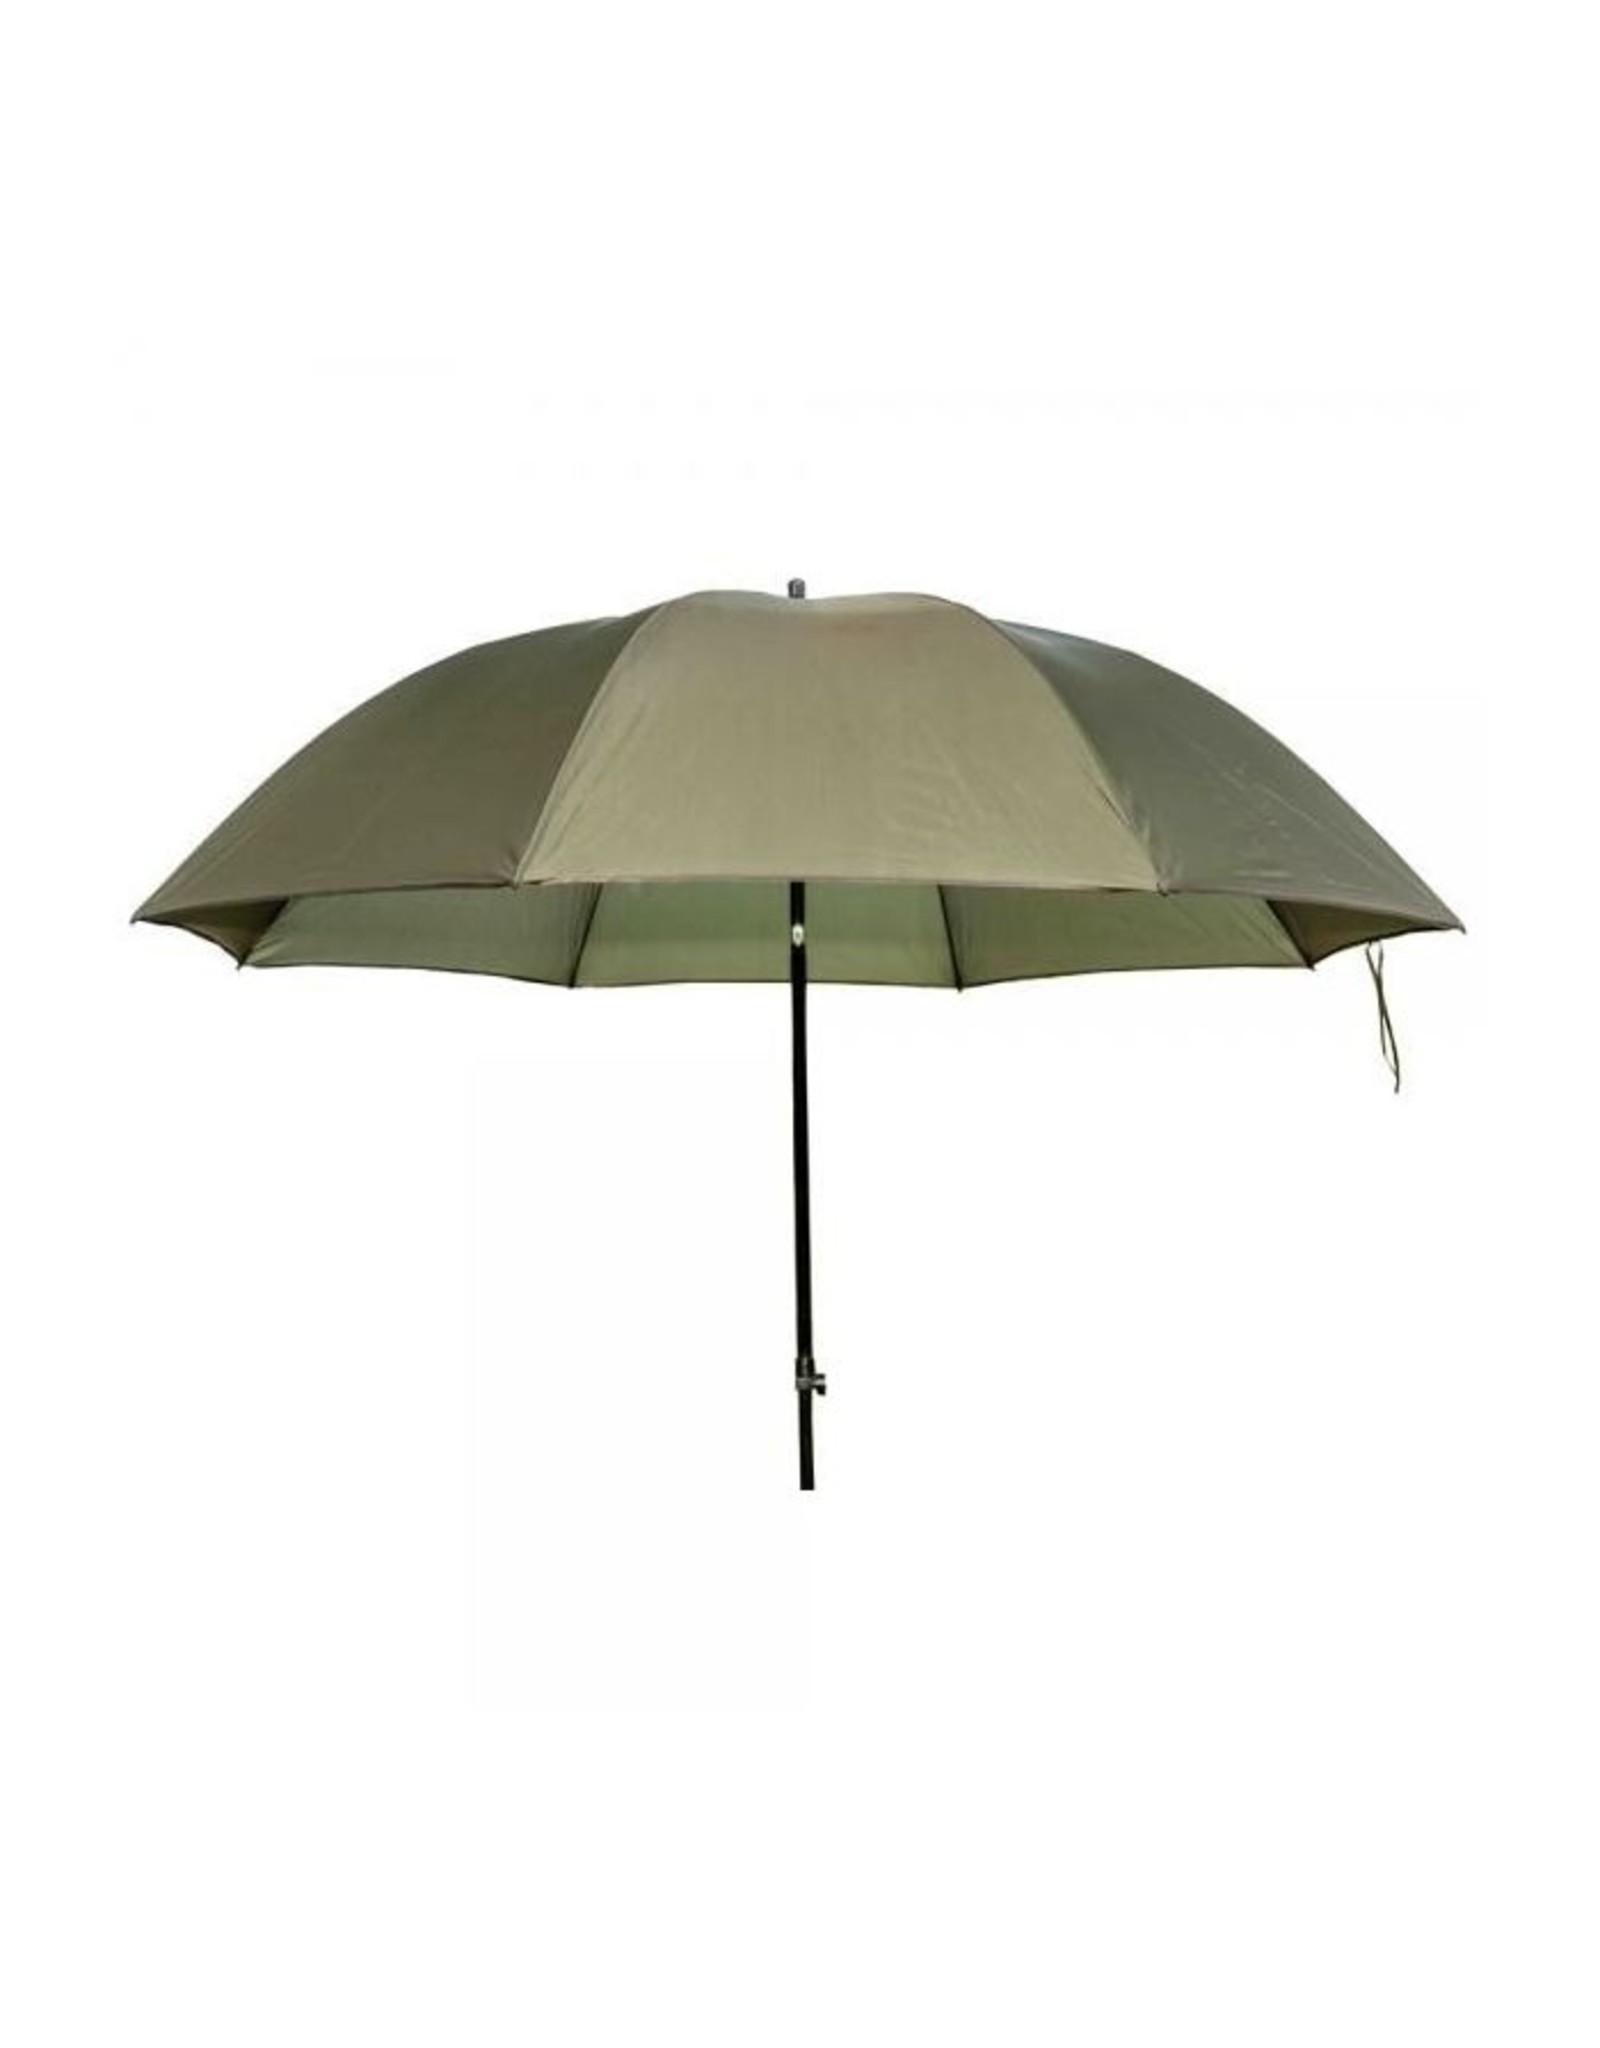 Acis Acis paraplu 230 cm